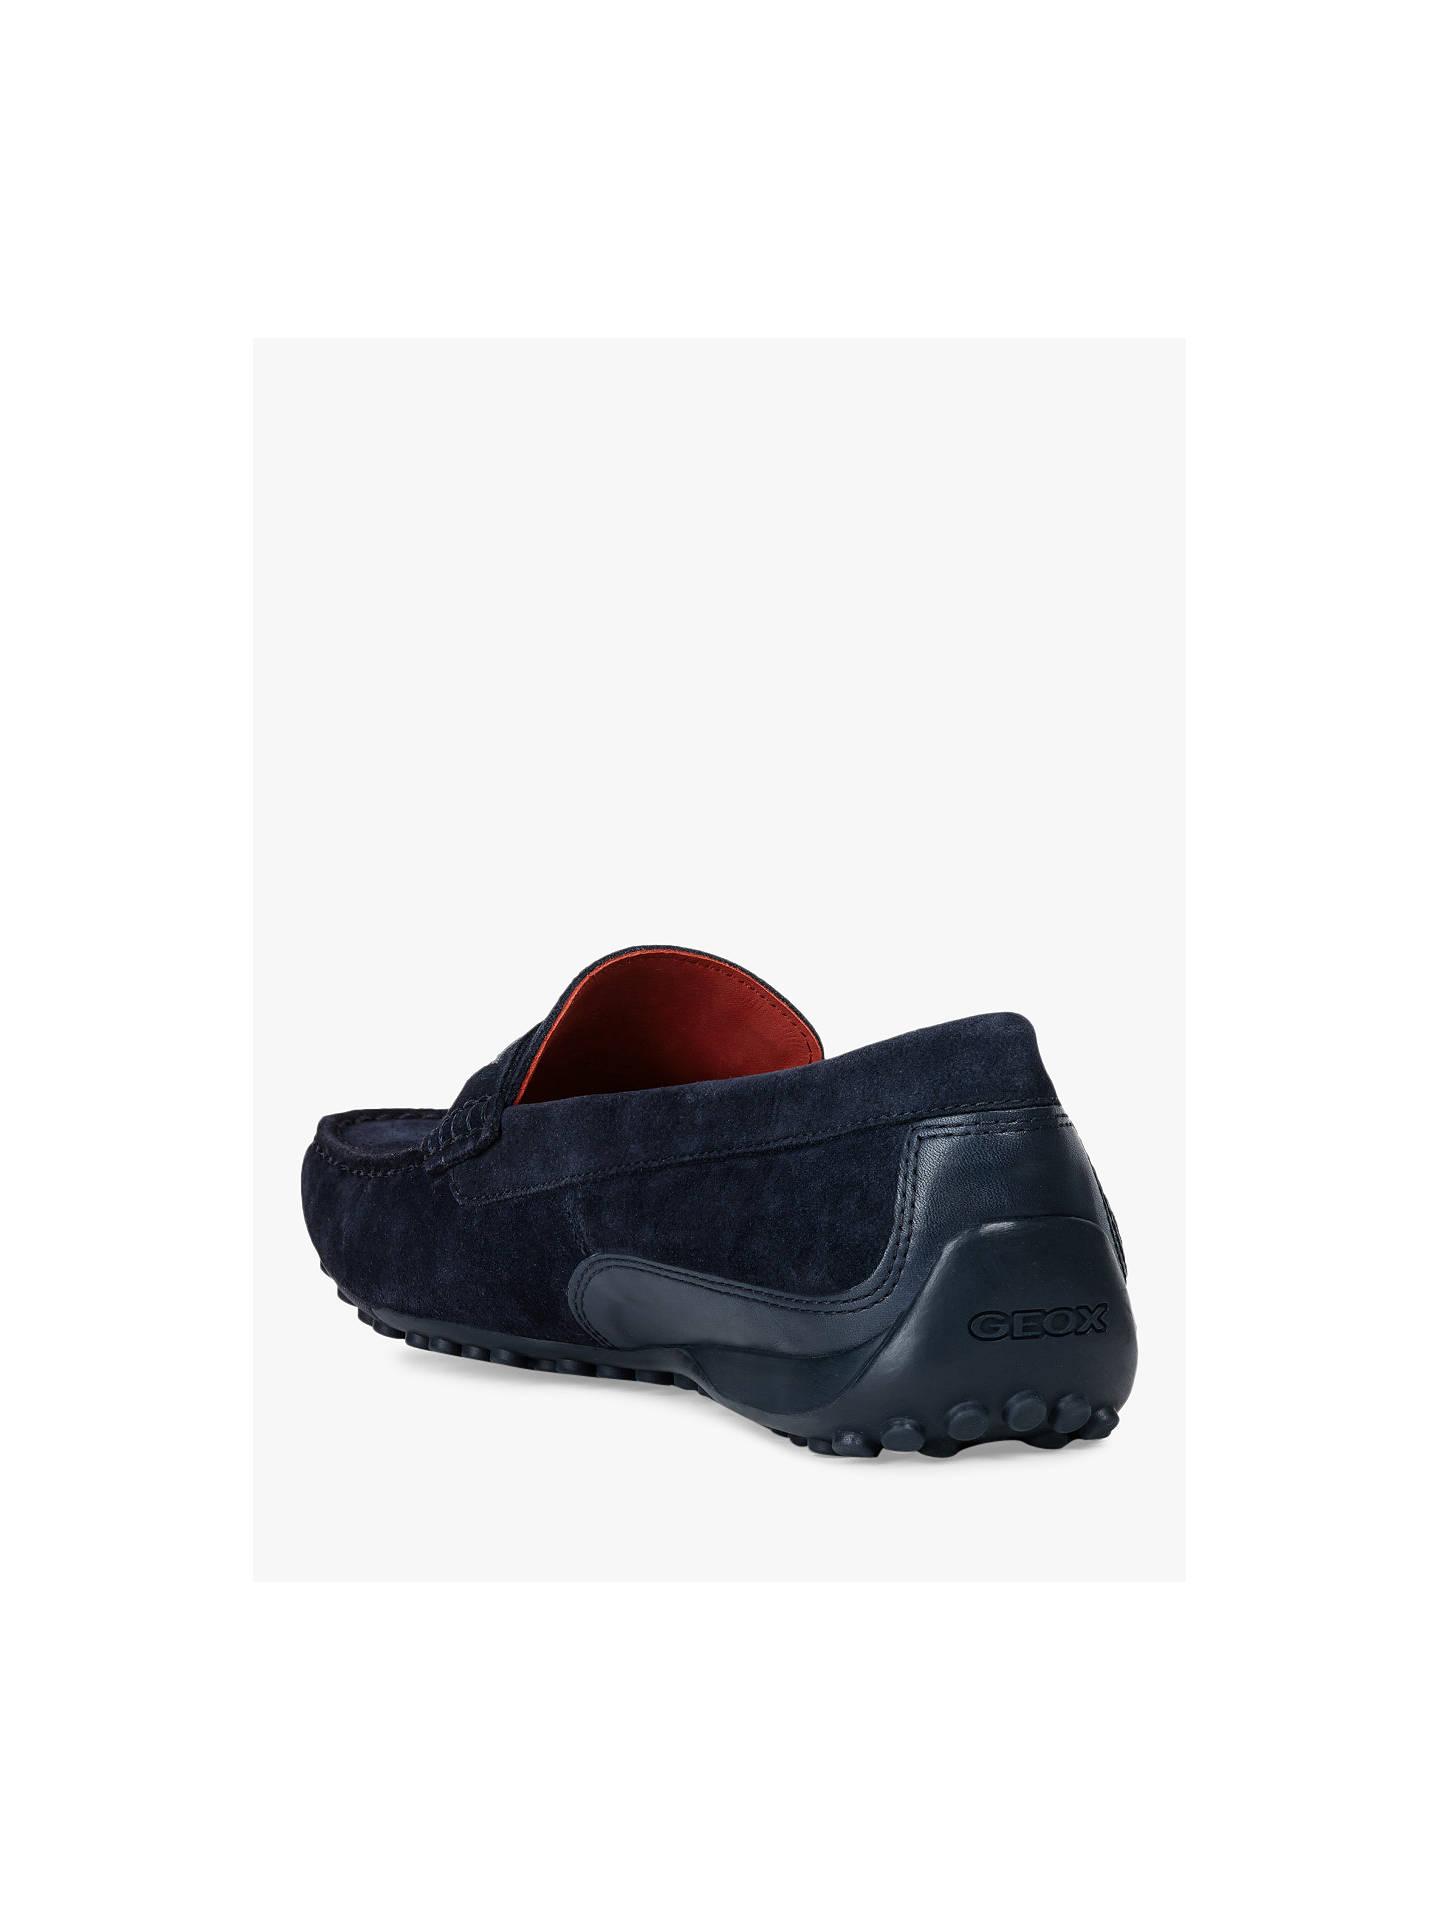 1078d02083c ... Buy Geox Snake Suede Moccasin Shoes, Blue, 10.5 Online at johnlewis.com  ...